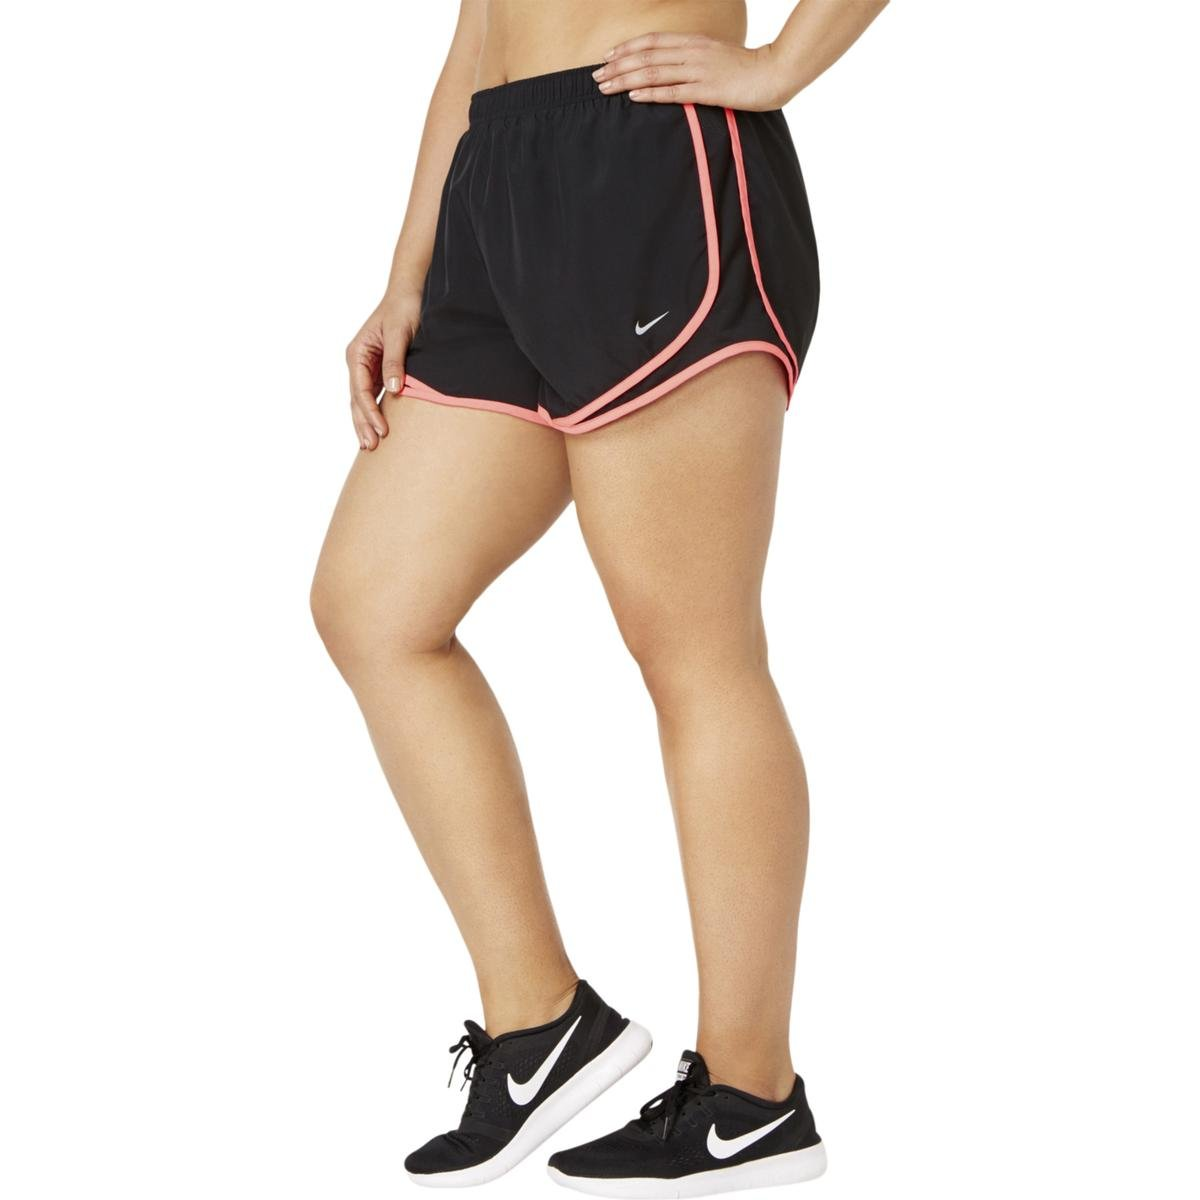 NIKE Womens Plus Tempo Running Fitness Shorts Black 1X